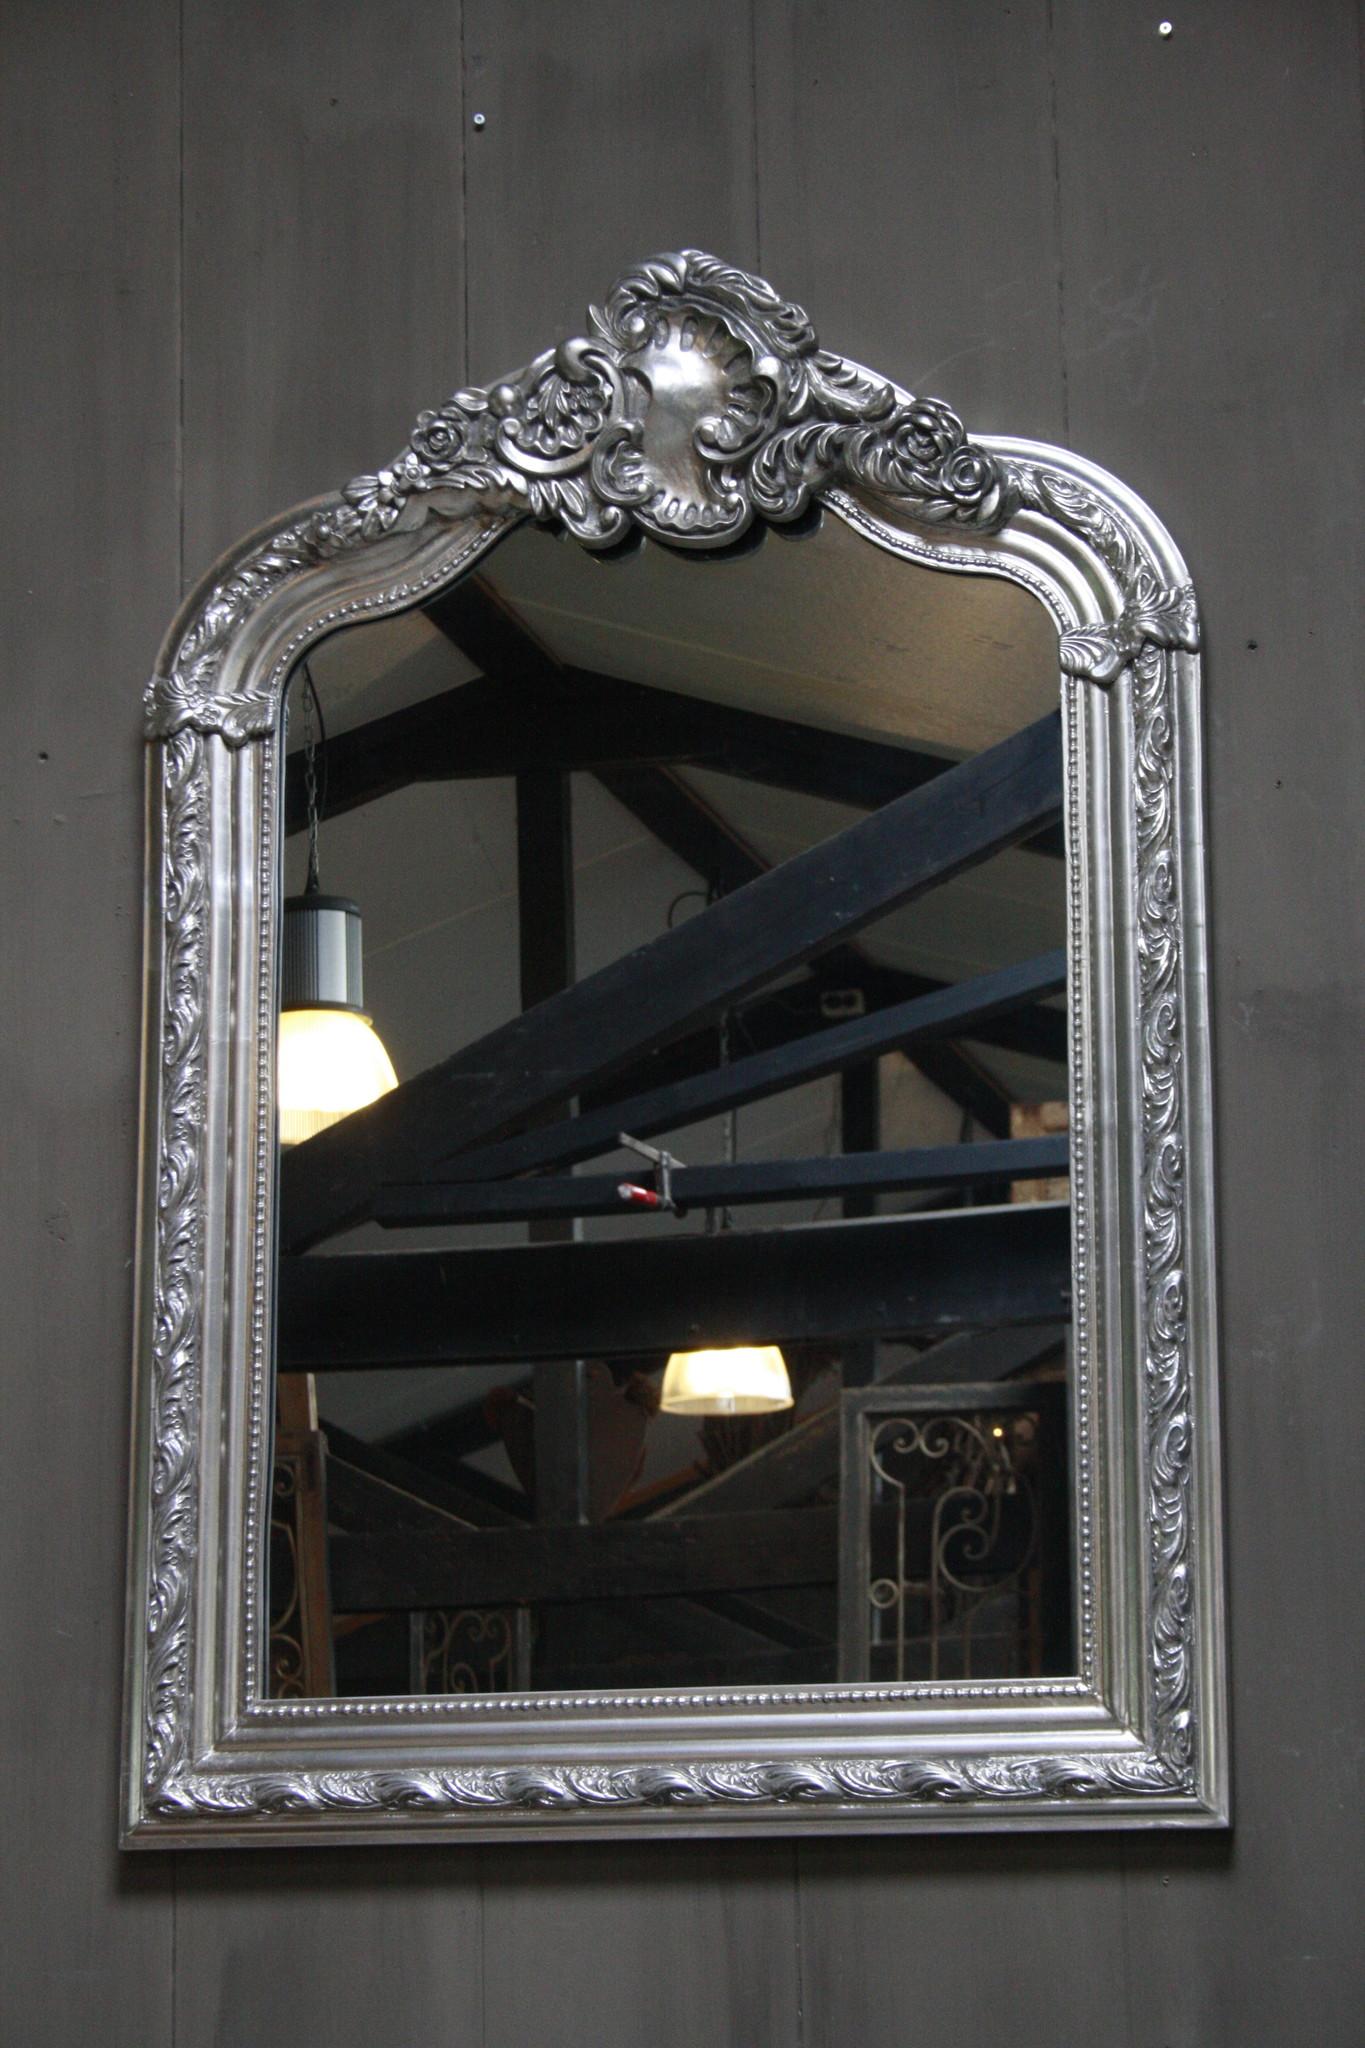 Kuifspiegel Barok Roma Zilver 117 x 80 cm-2